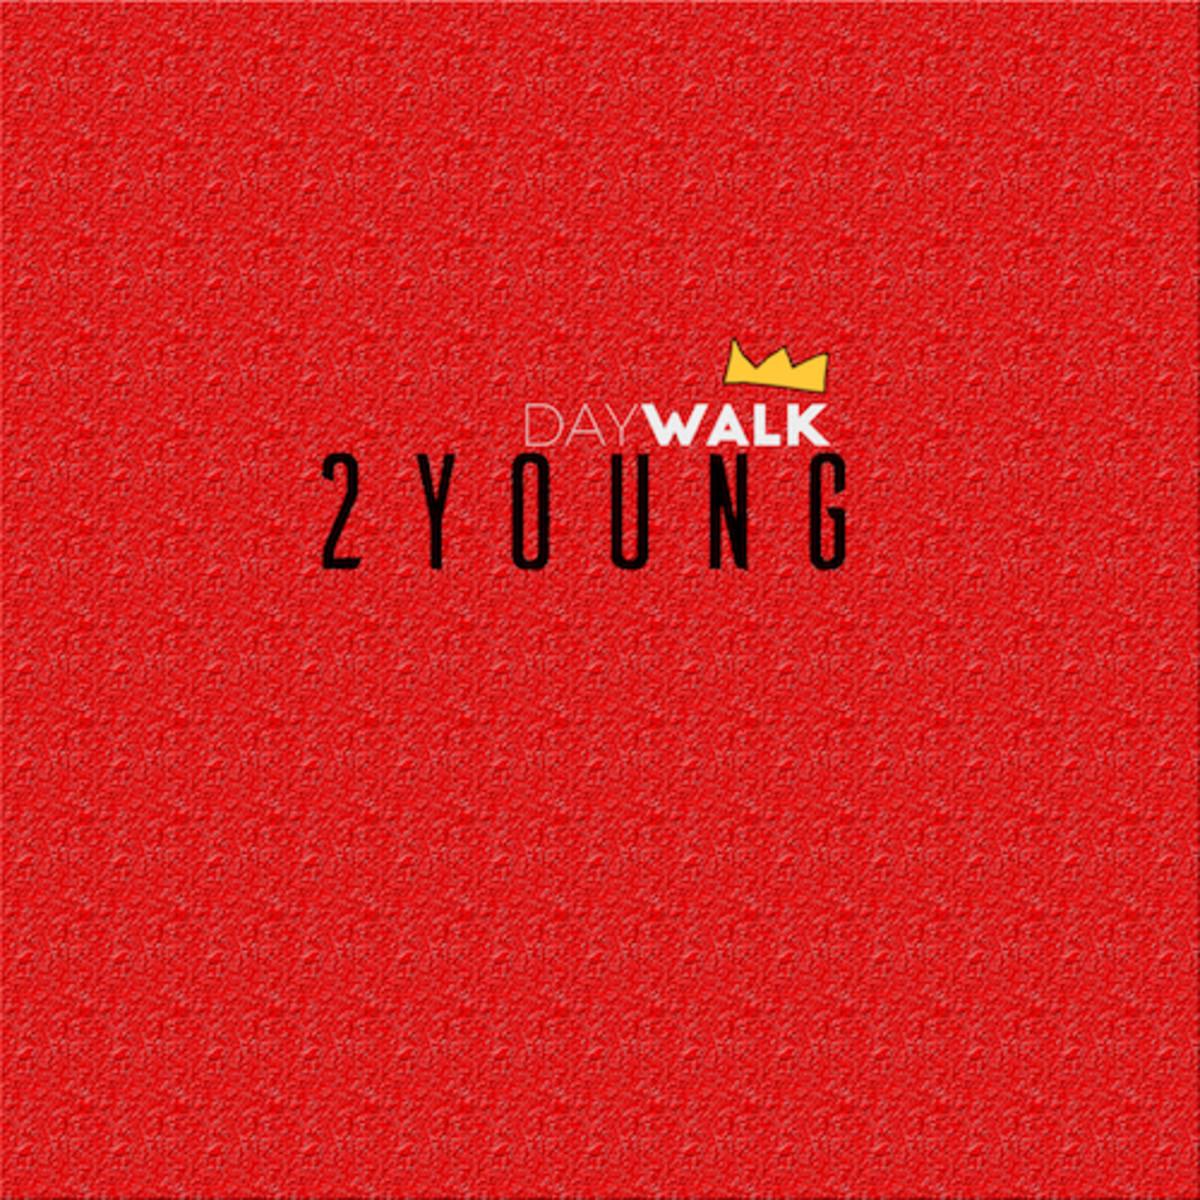 daywalk-2-young.jpg